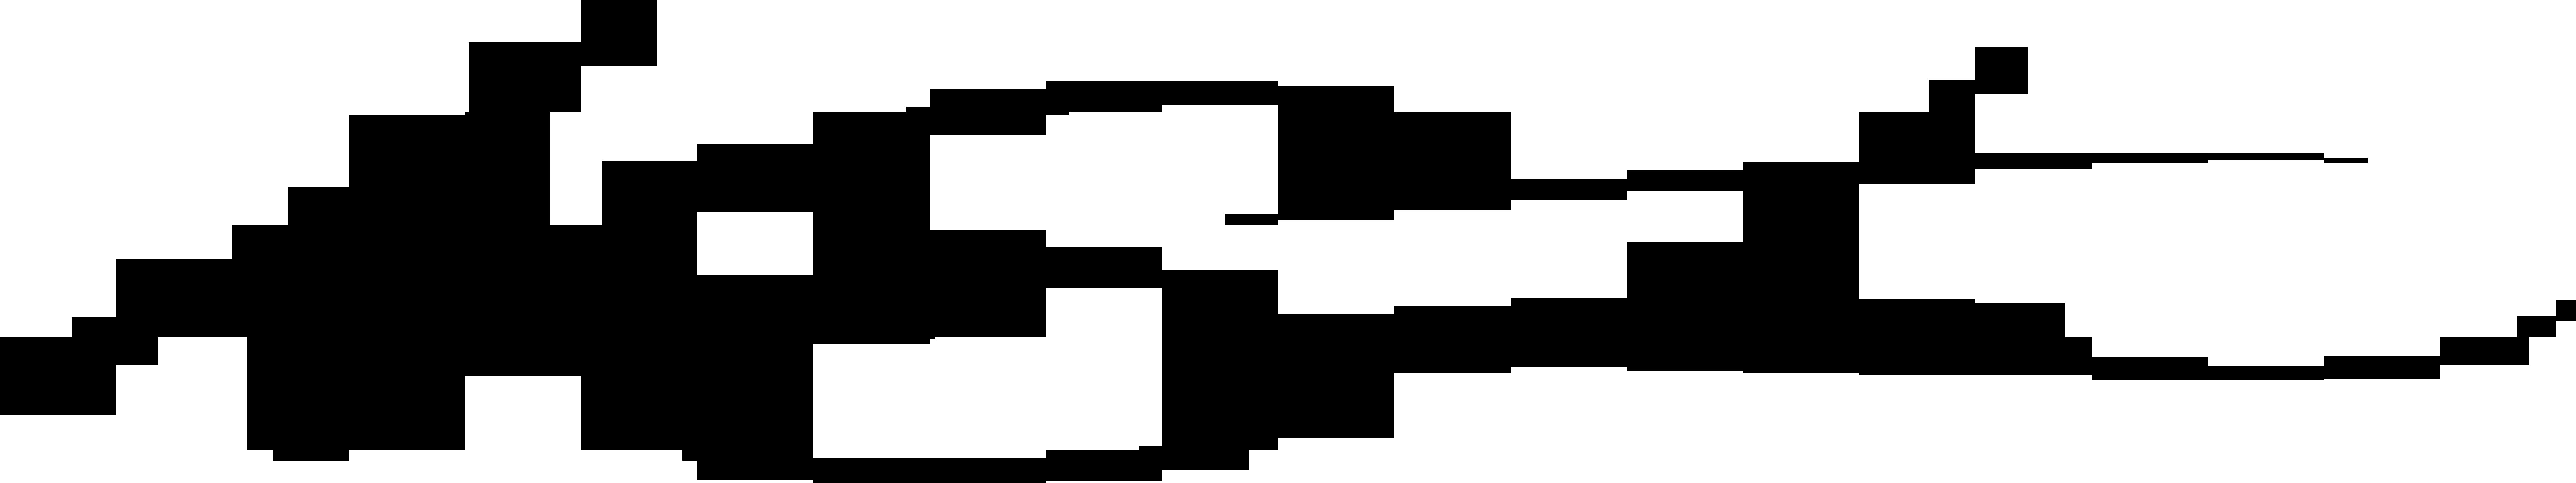 adam santana's Signature